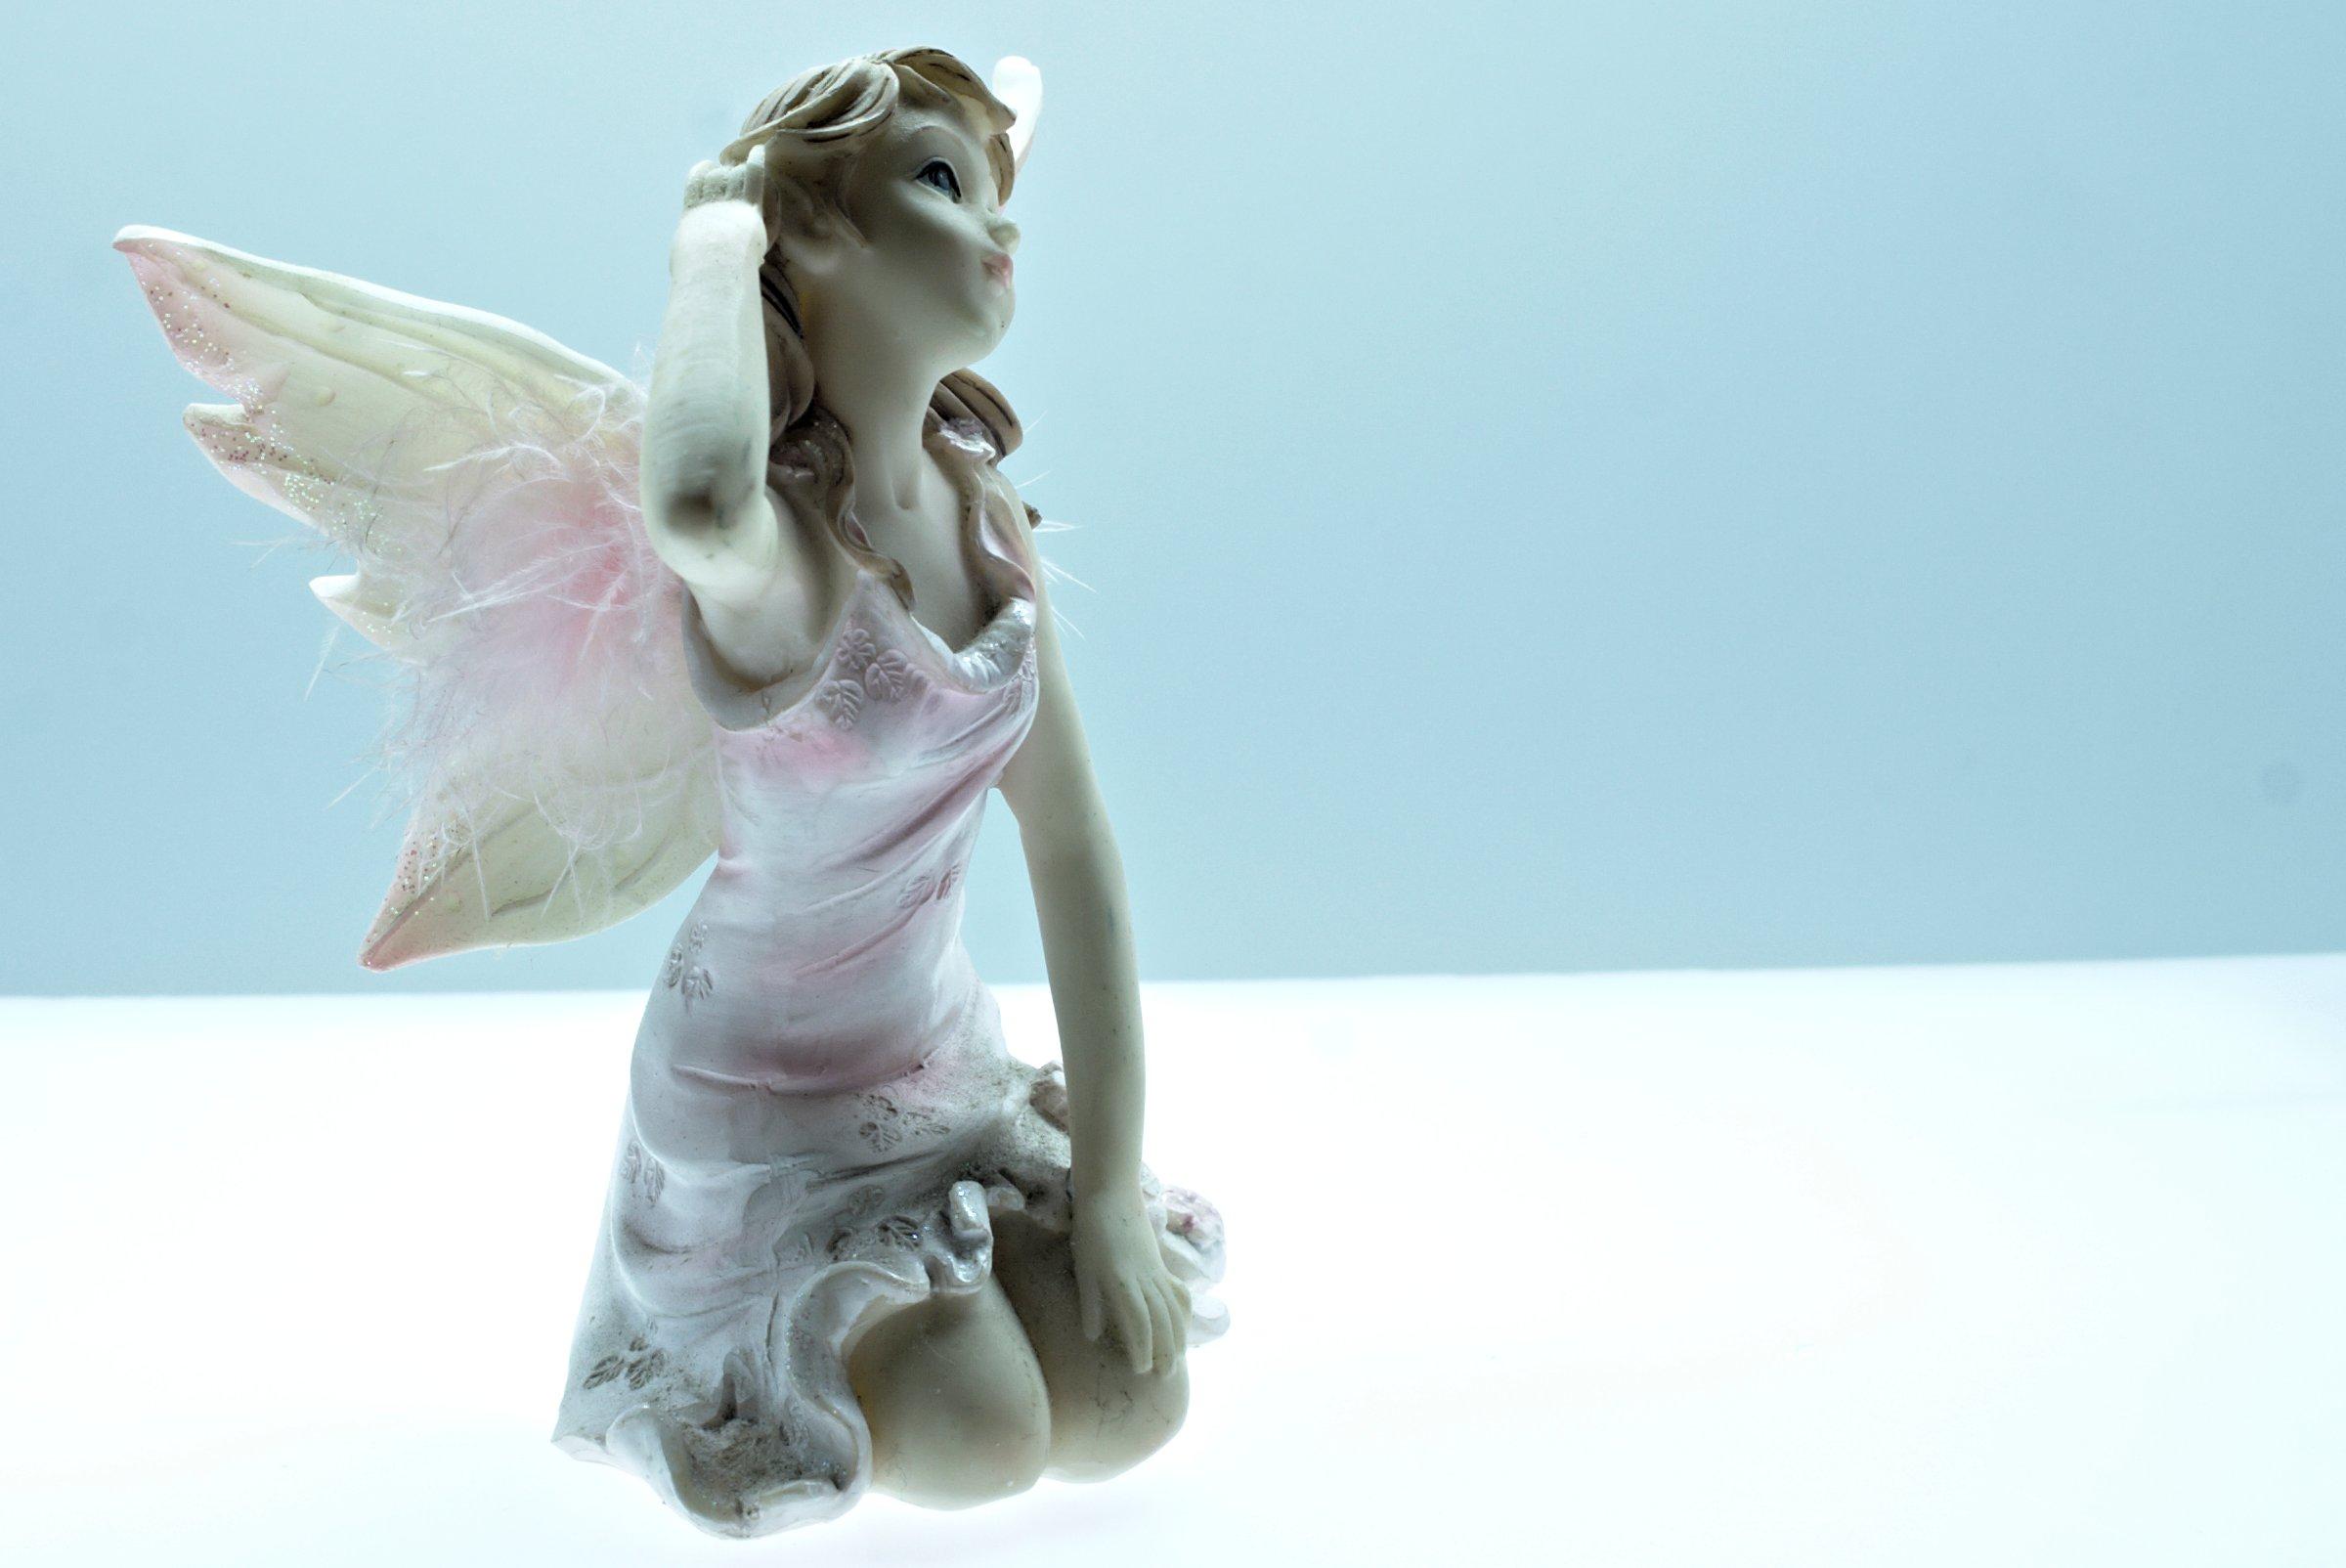 Angel figurine photo